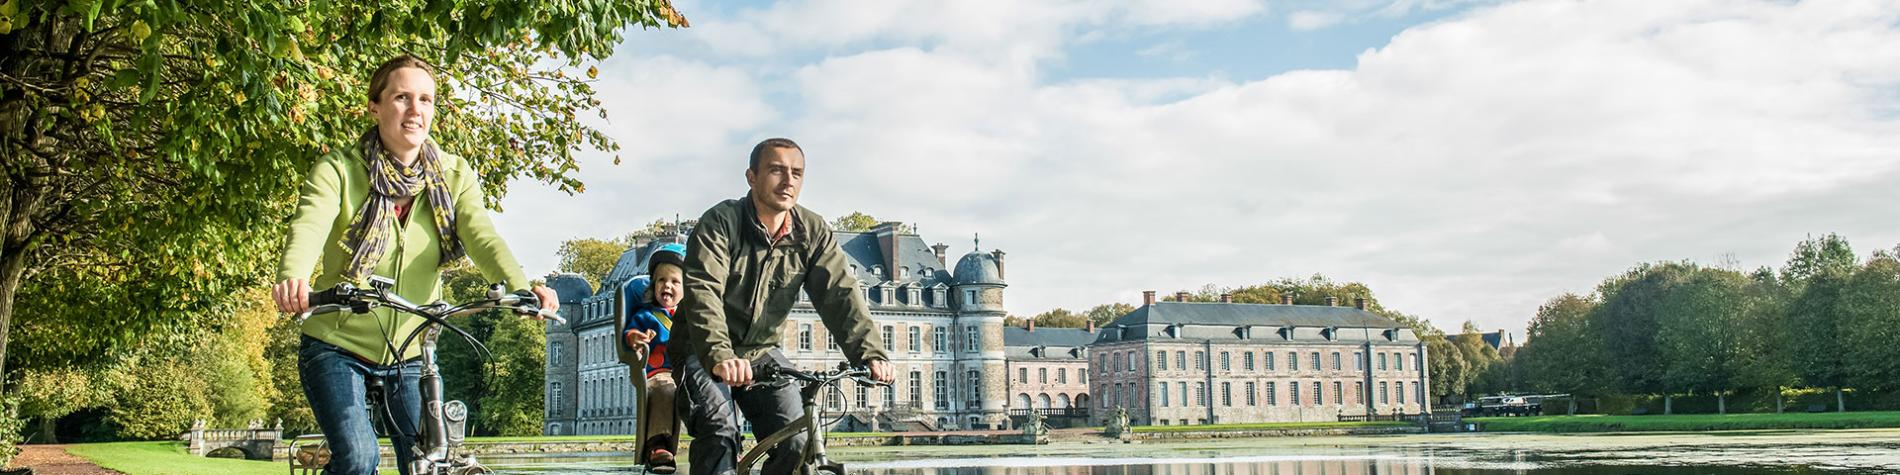 Balade - vélo - Château de Beloeil